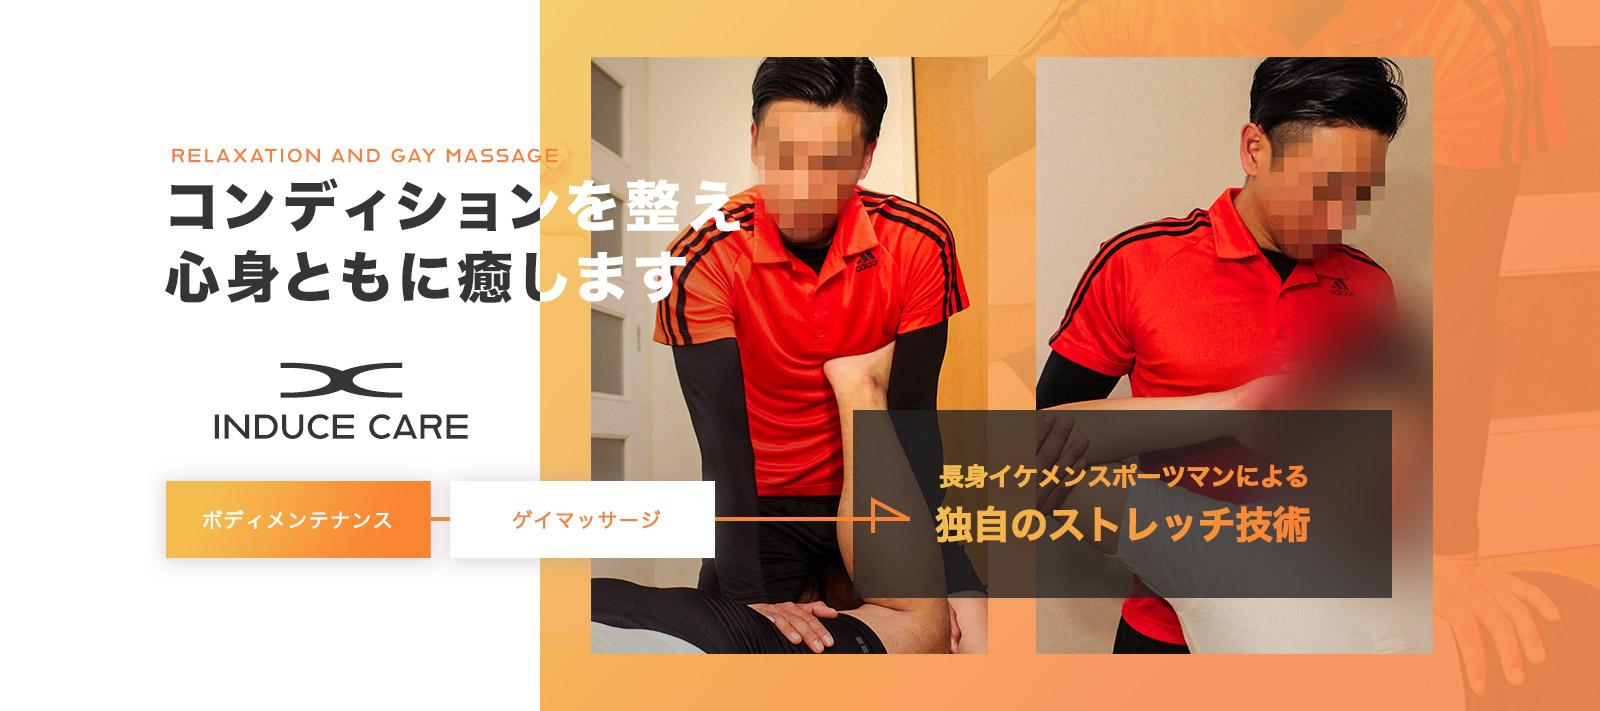 名古屋 INDUCE CARE